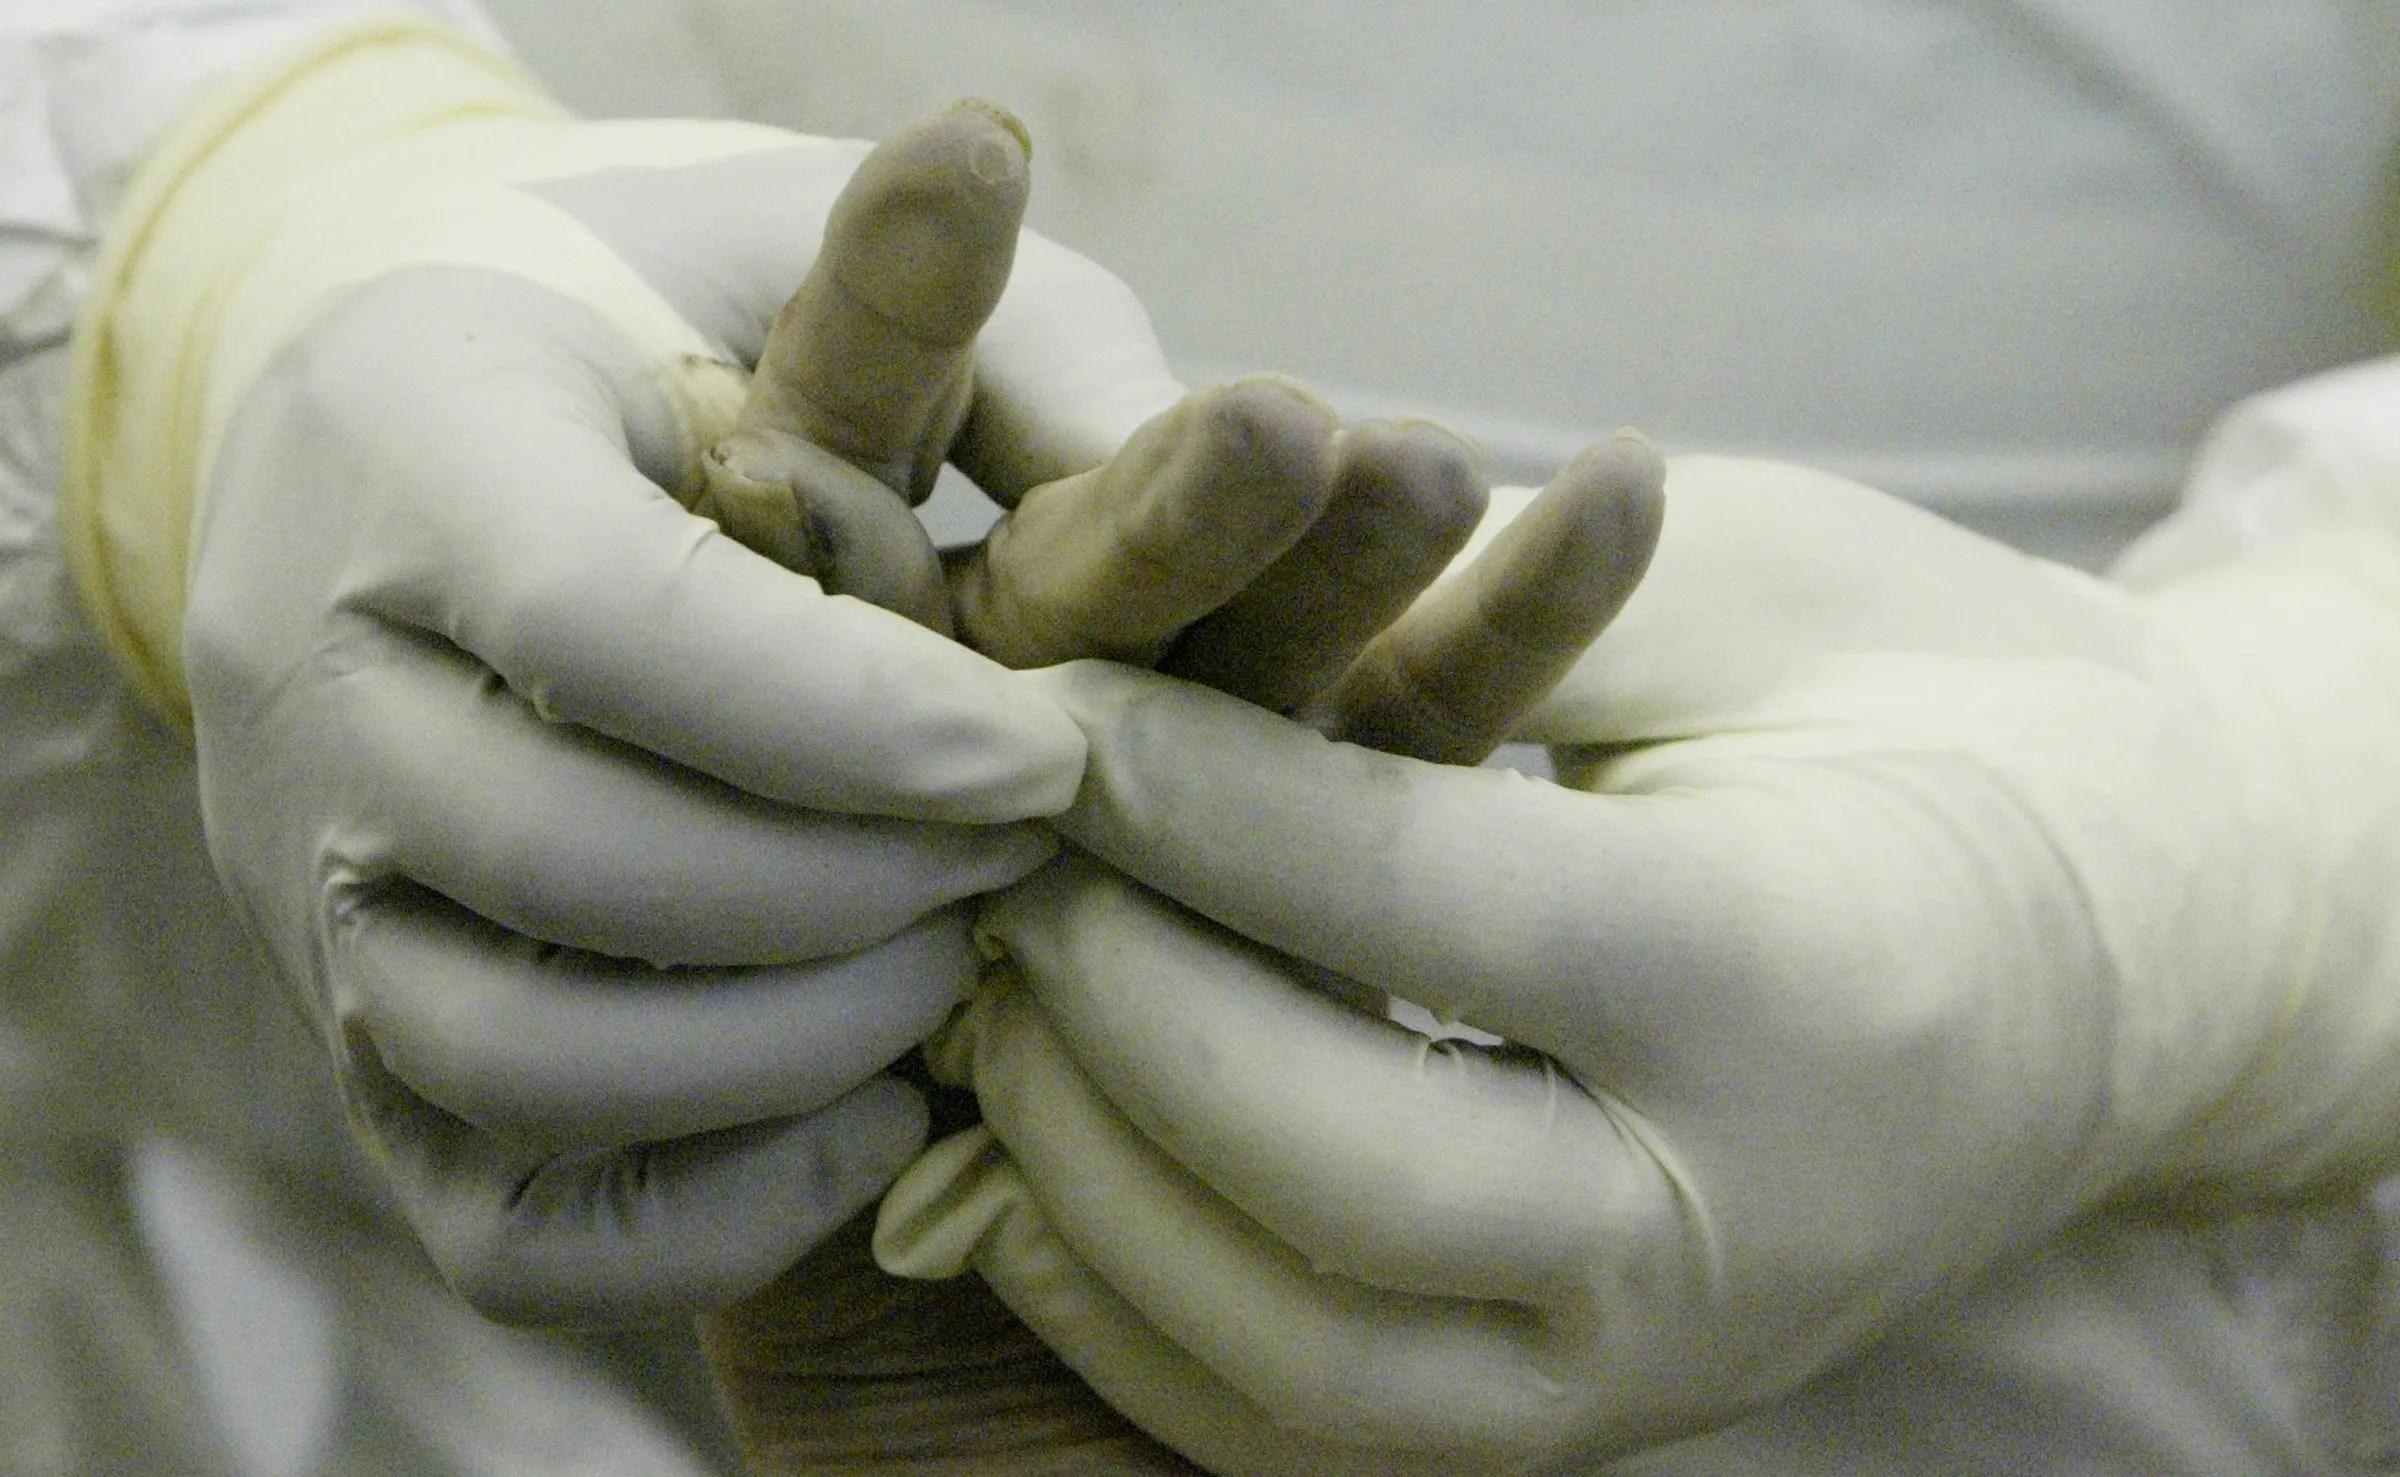 Iowa Medical Examiner\u0027s Office could lose accreditation - medical examiner job description